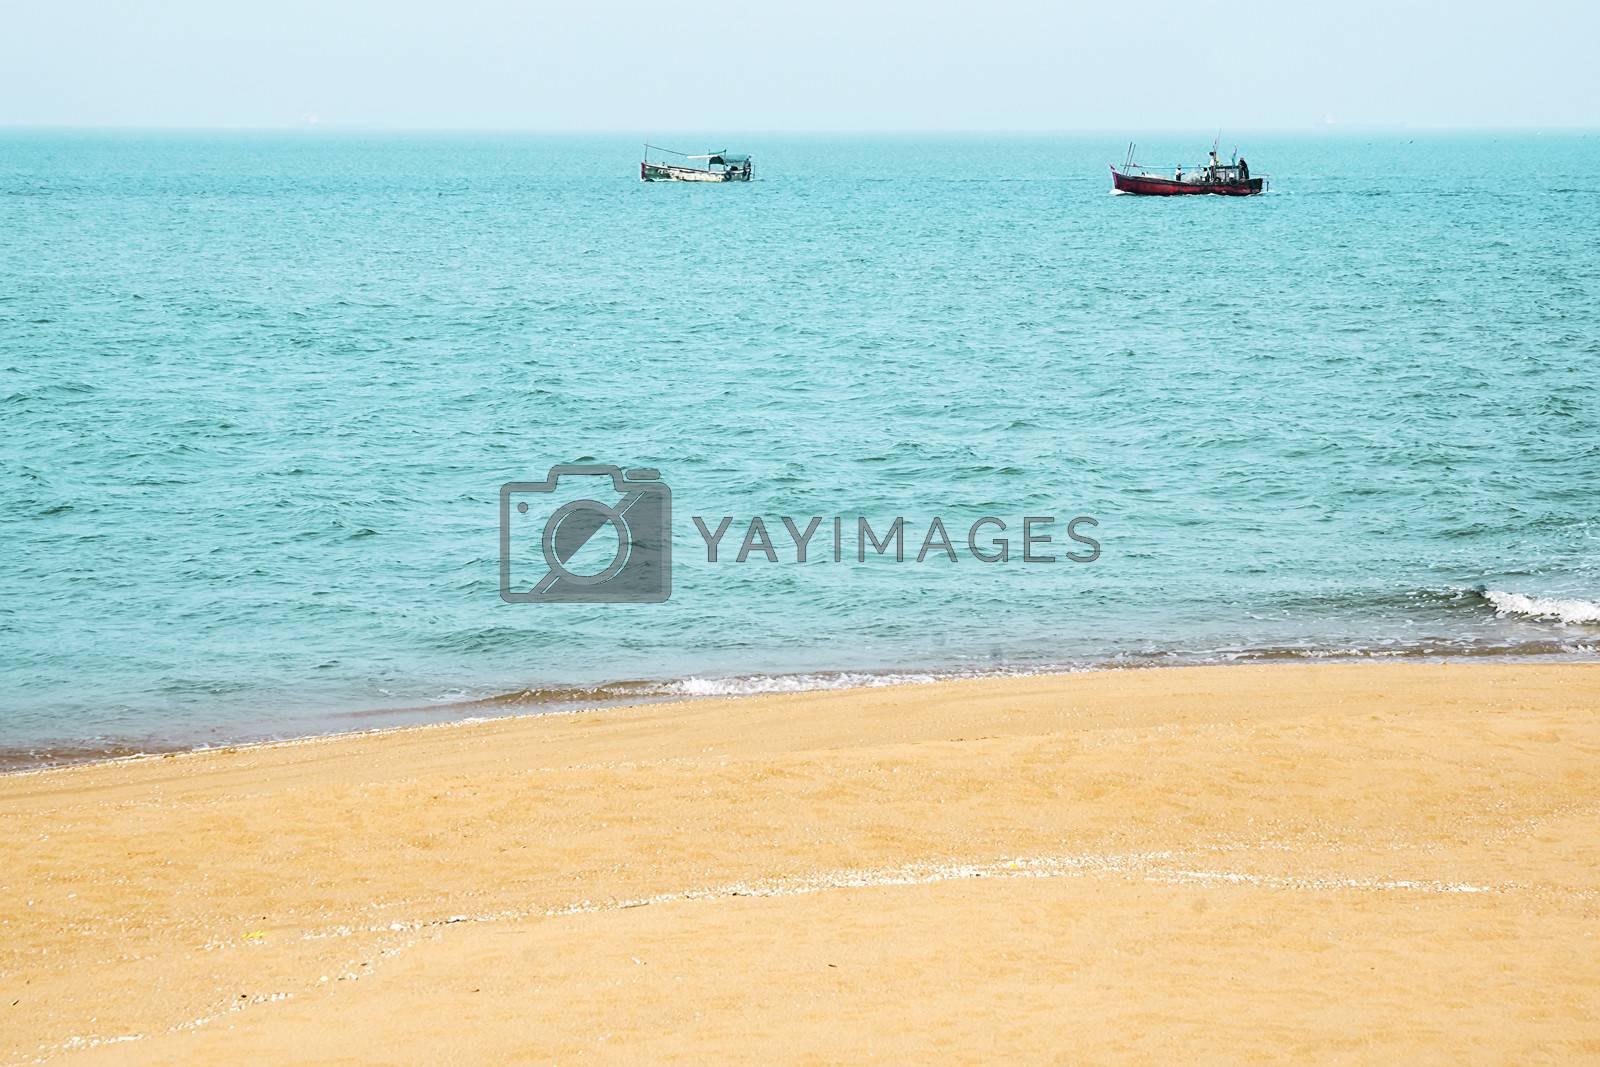 China's Hainan Island tropical coastal scenery by xfdly5